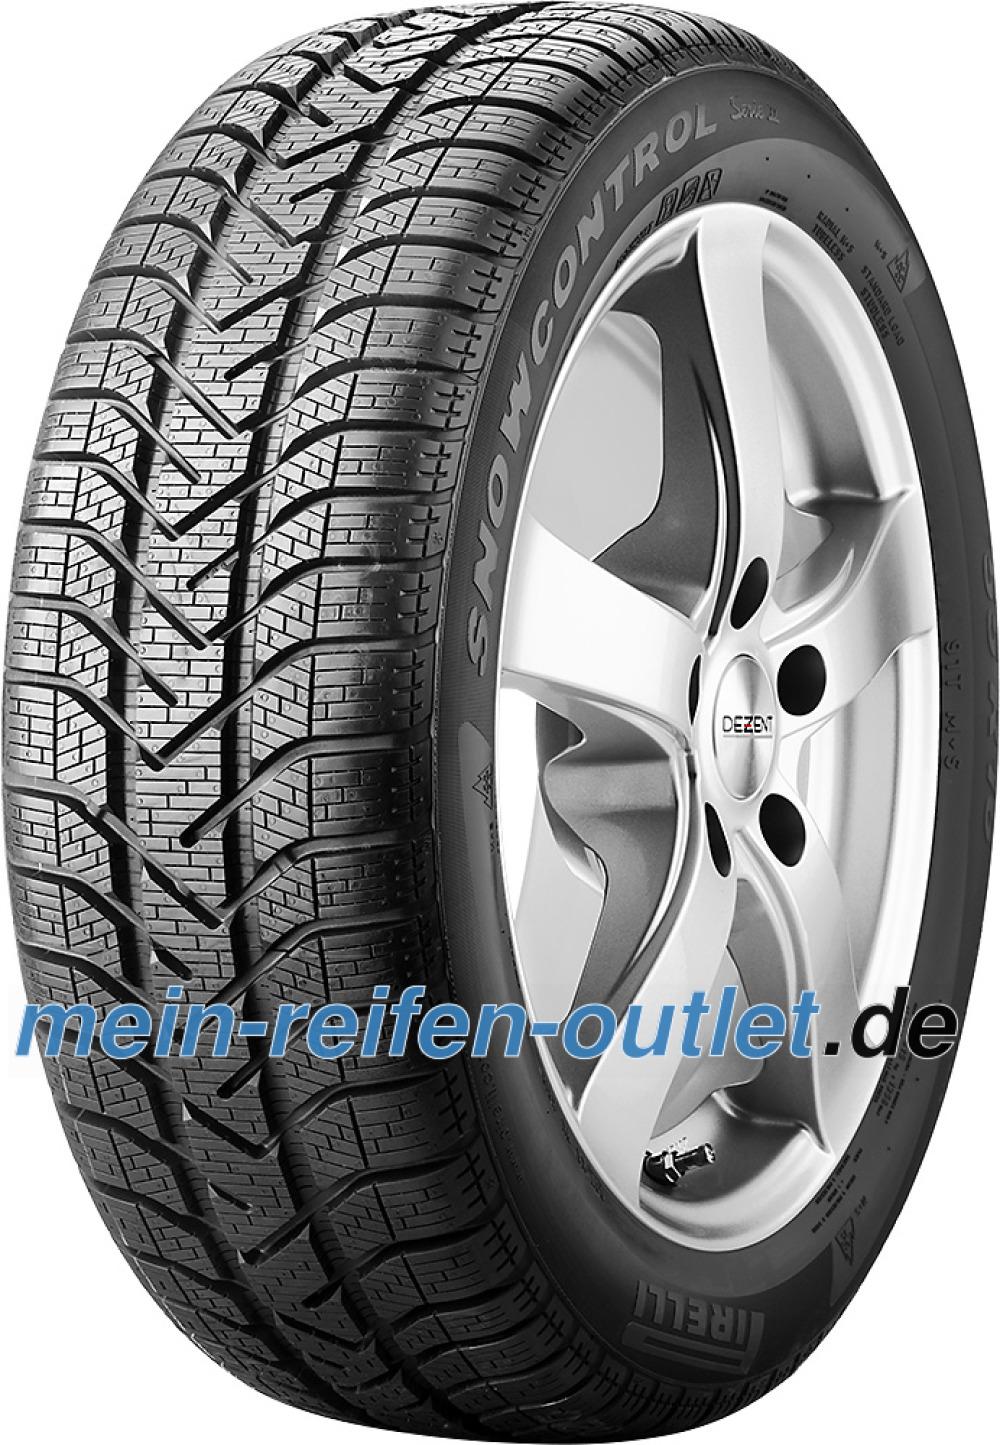 Pirelli W 210 Snowcontrol Serie II ( 185/55 R15 86H XL ECOIMPACT )